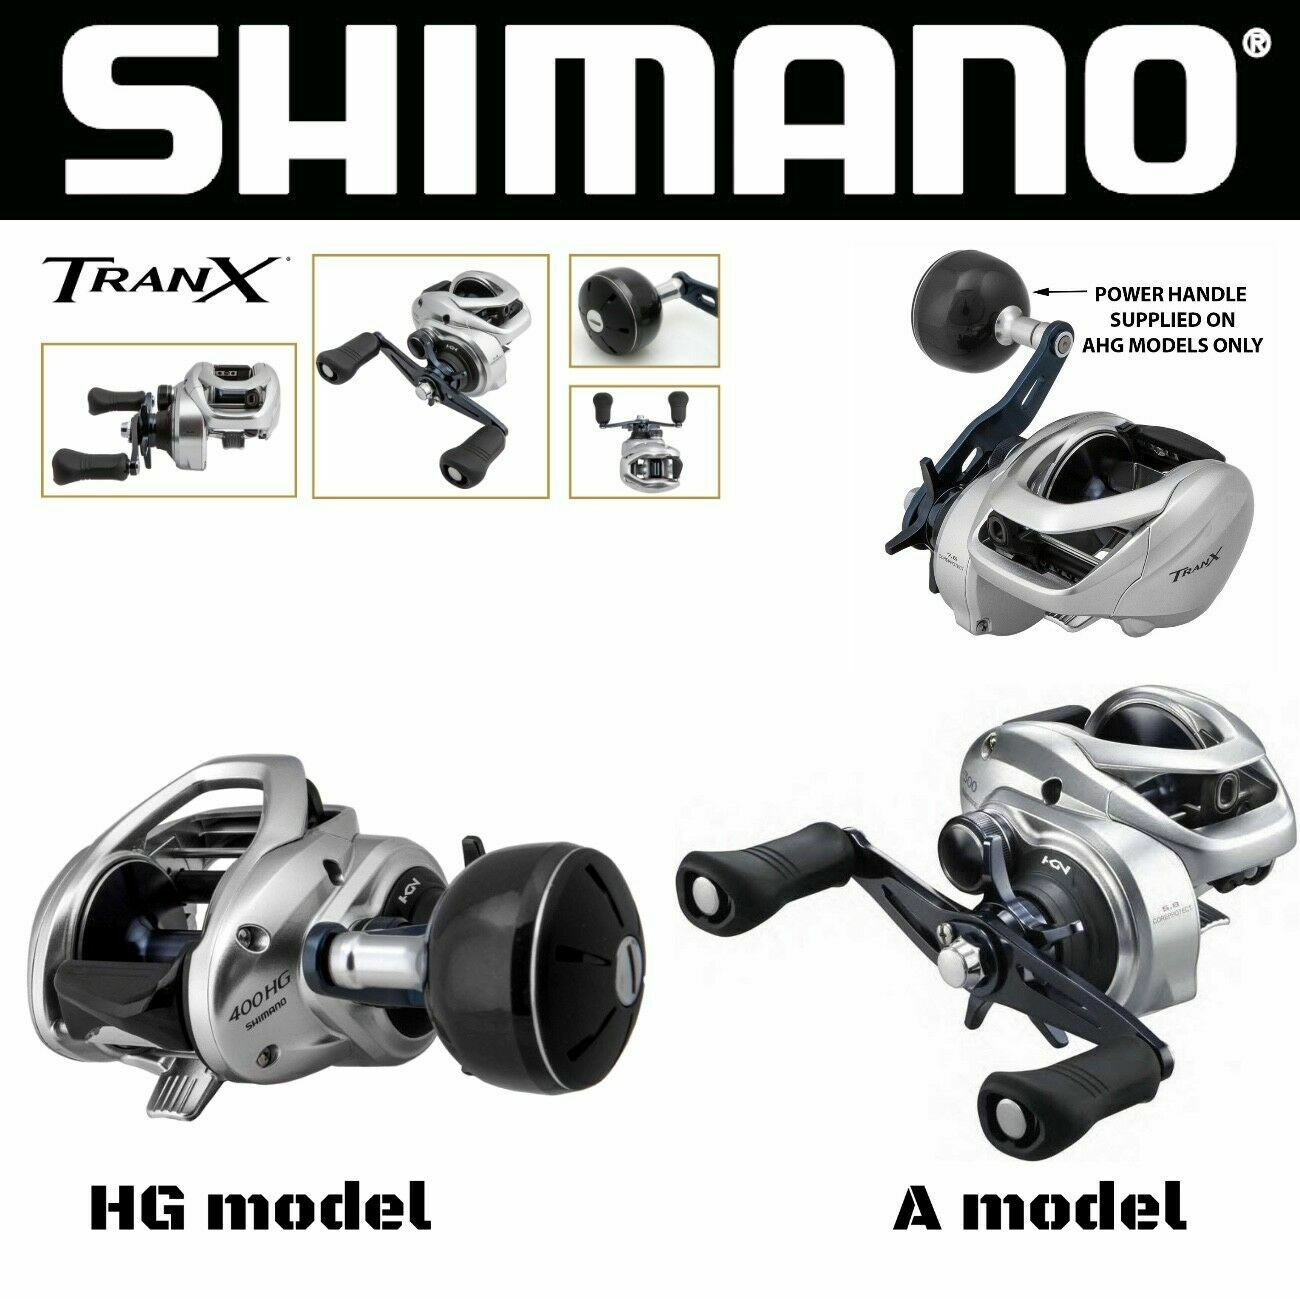 Shimano basso profilo Casting Reel TranX